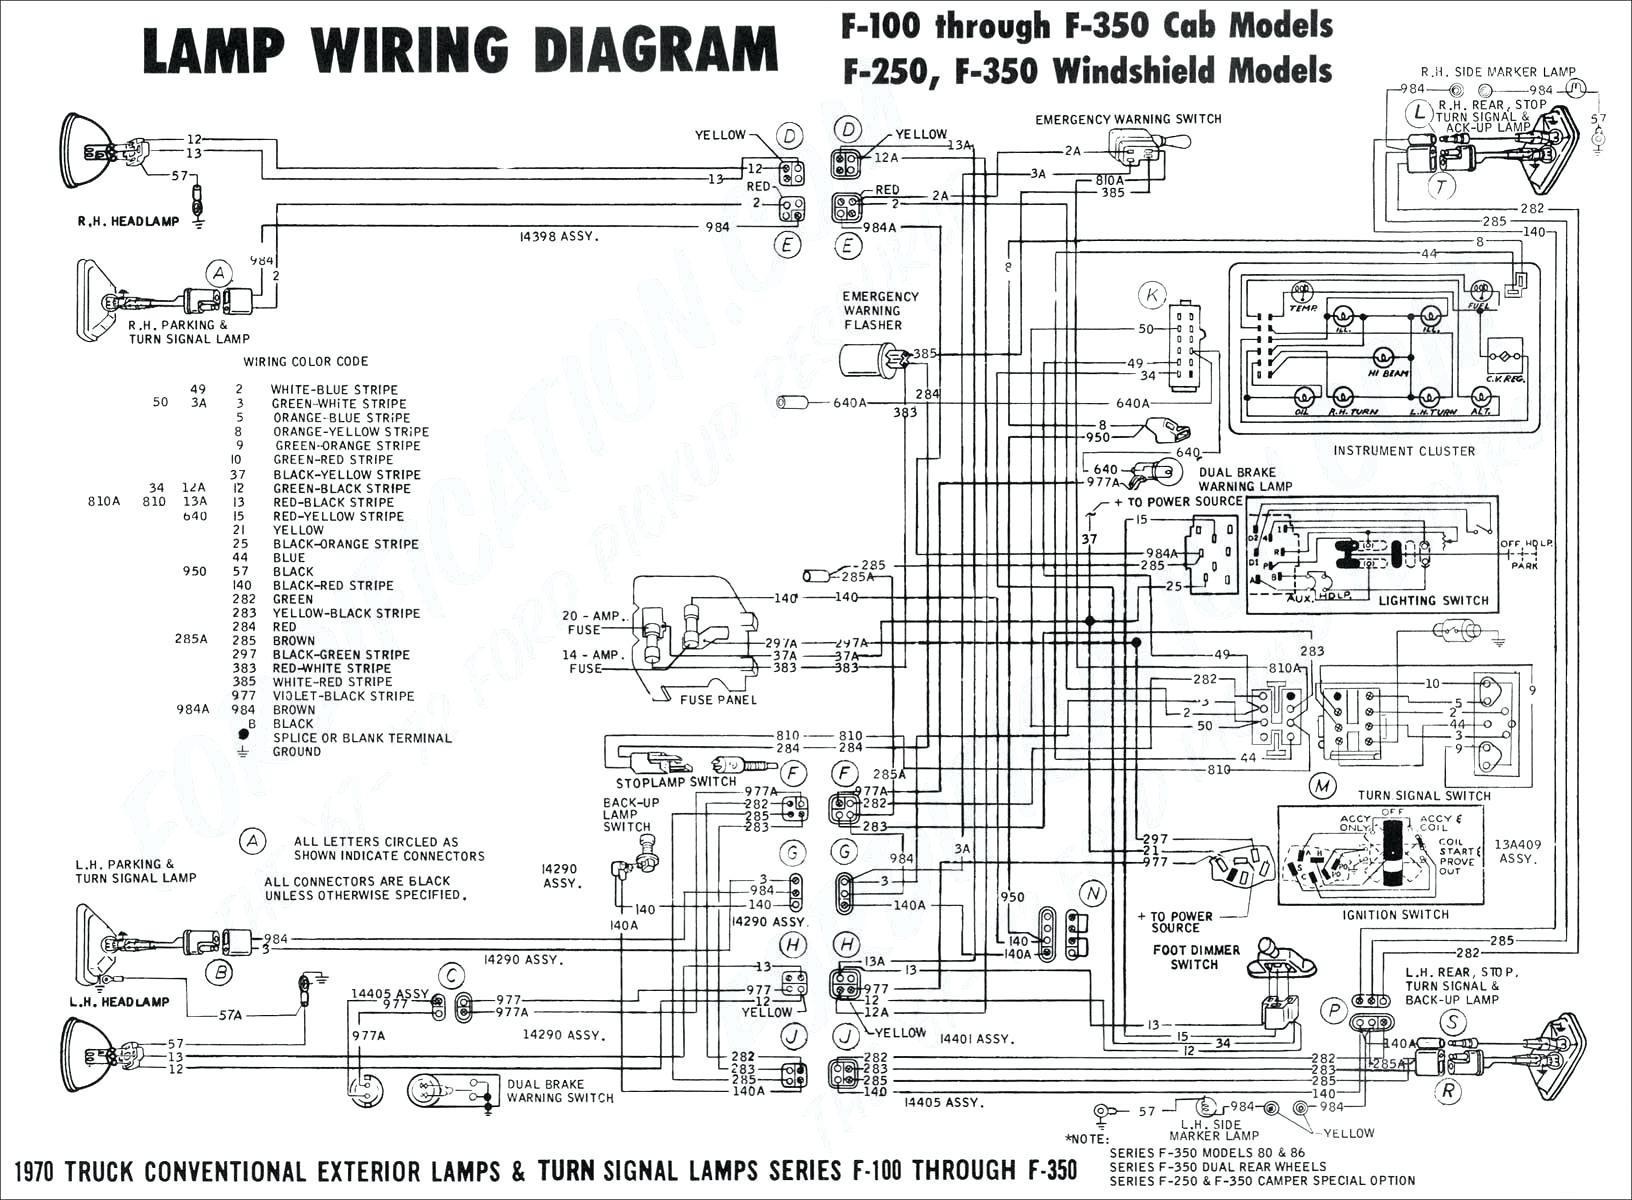 1989 ford f150 ignition wiring diagram image wiring diagram rh magnusrosen net Ford HEI Distributor Wiring Diagram Ford Truck Distributor Wiring